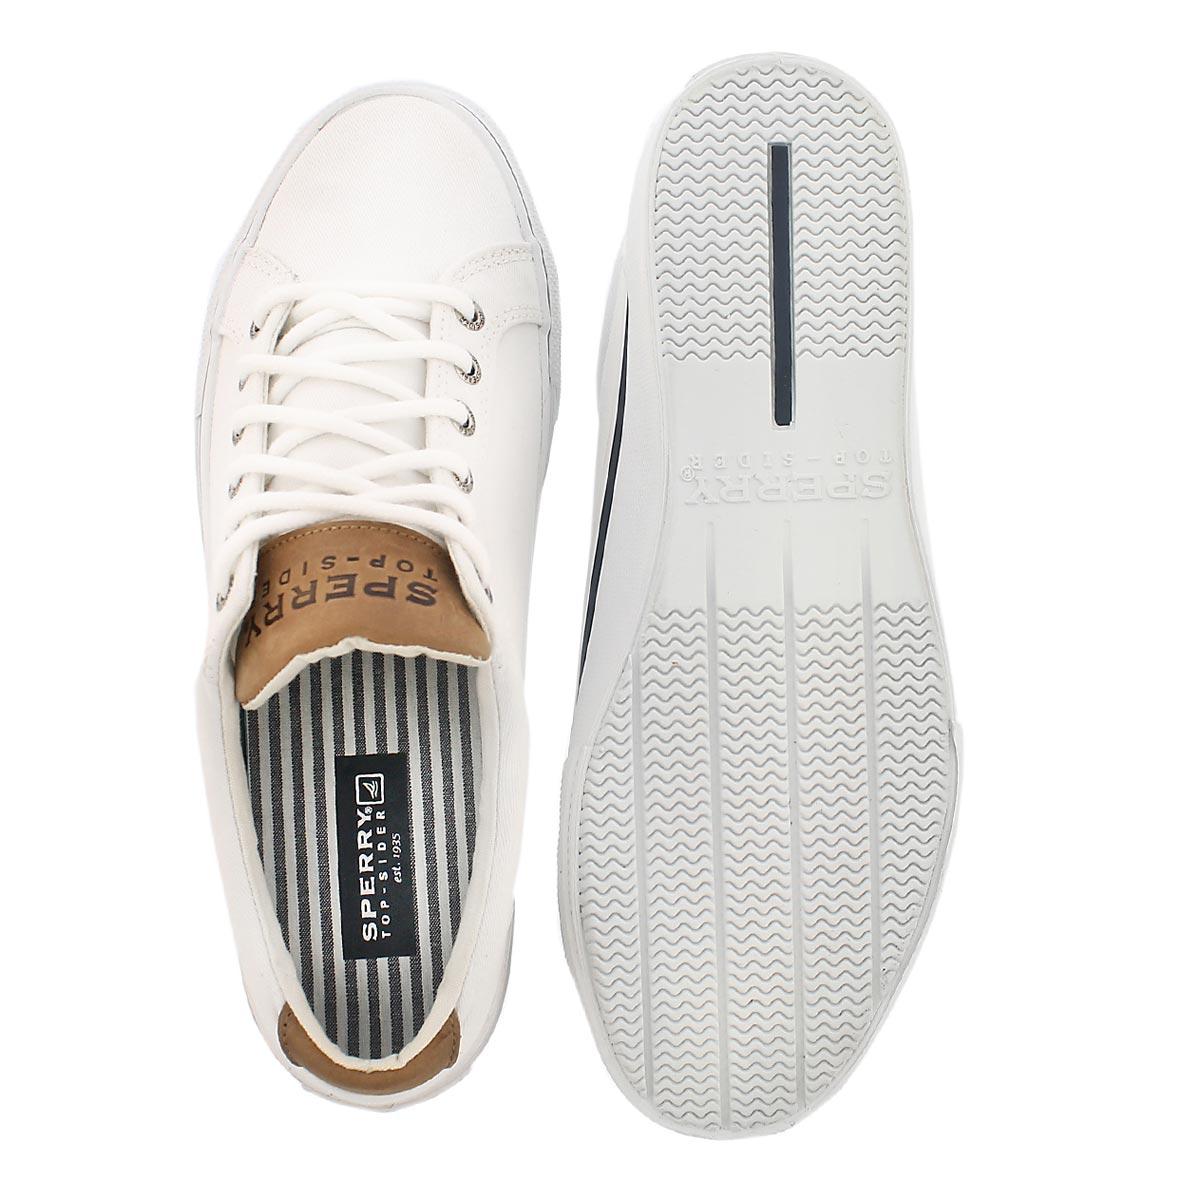 Mns Striper LTT white sneaker